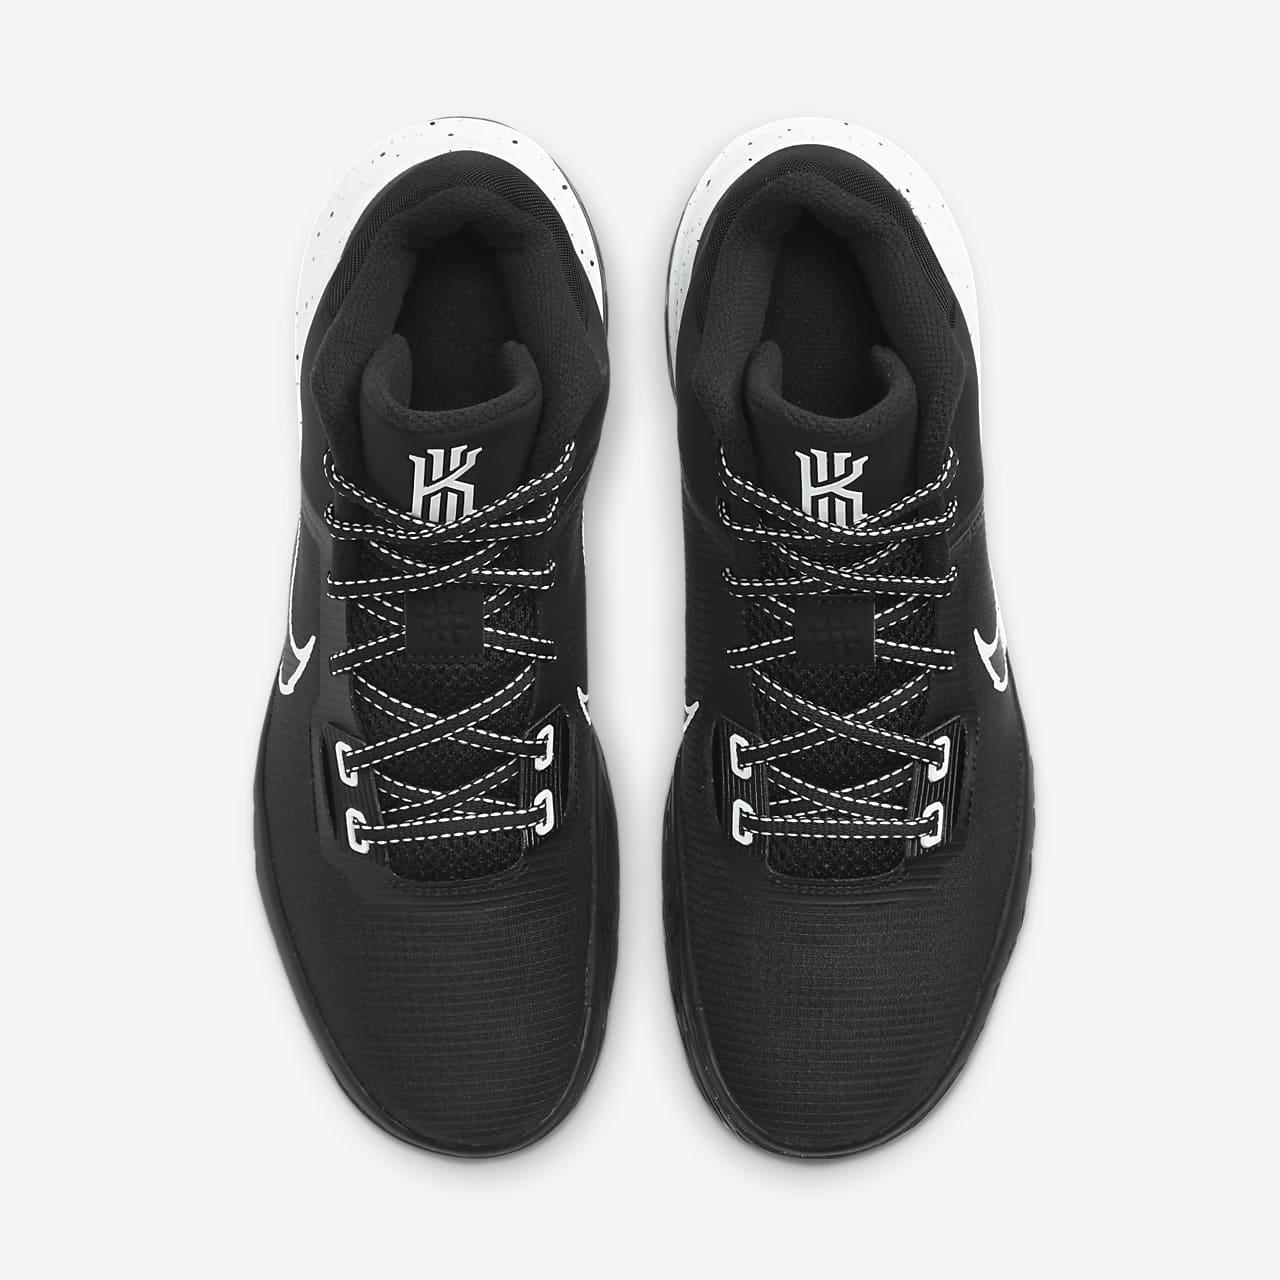 Kyrie Flytrap 4 Basketball Shoe CT1972-001